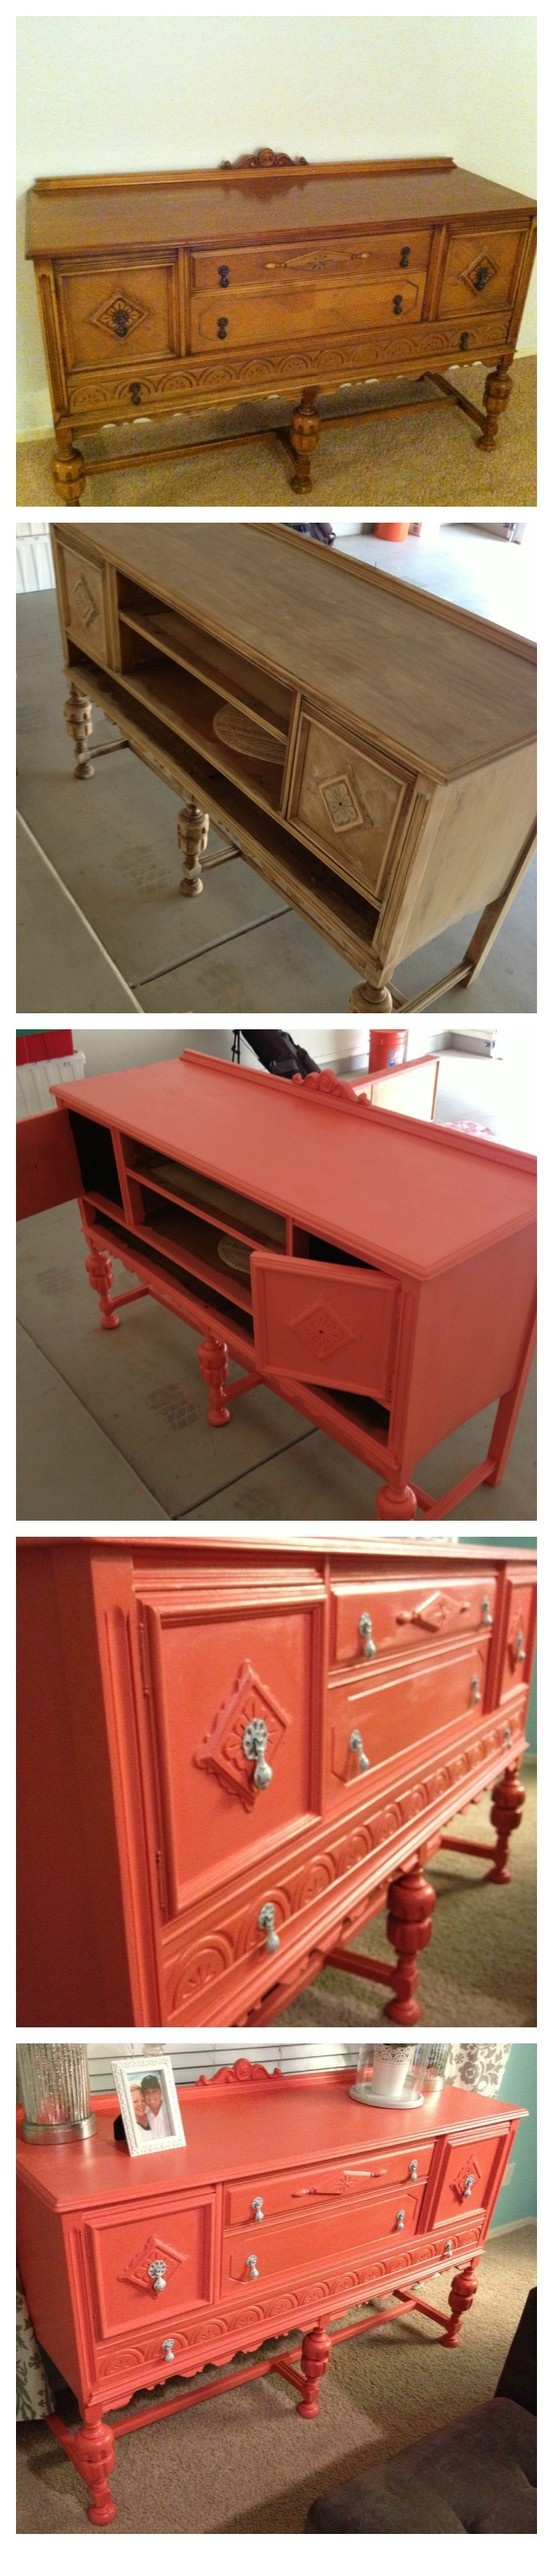 Diy Painted Furniture Diy Pinterest